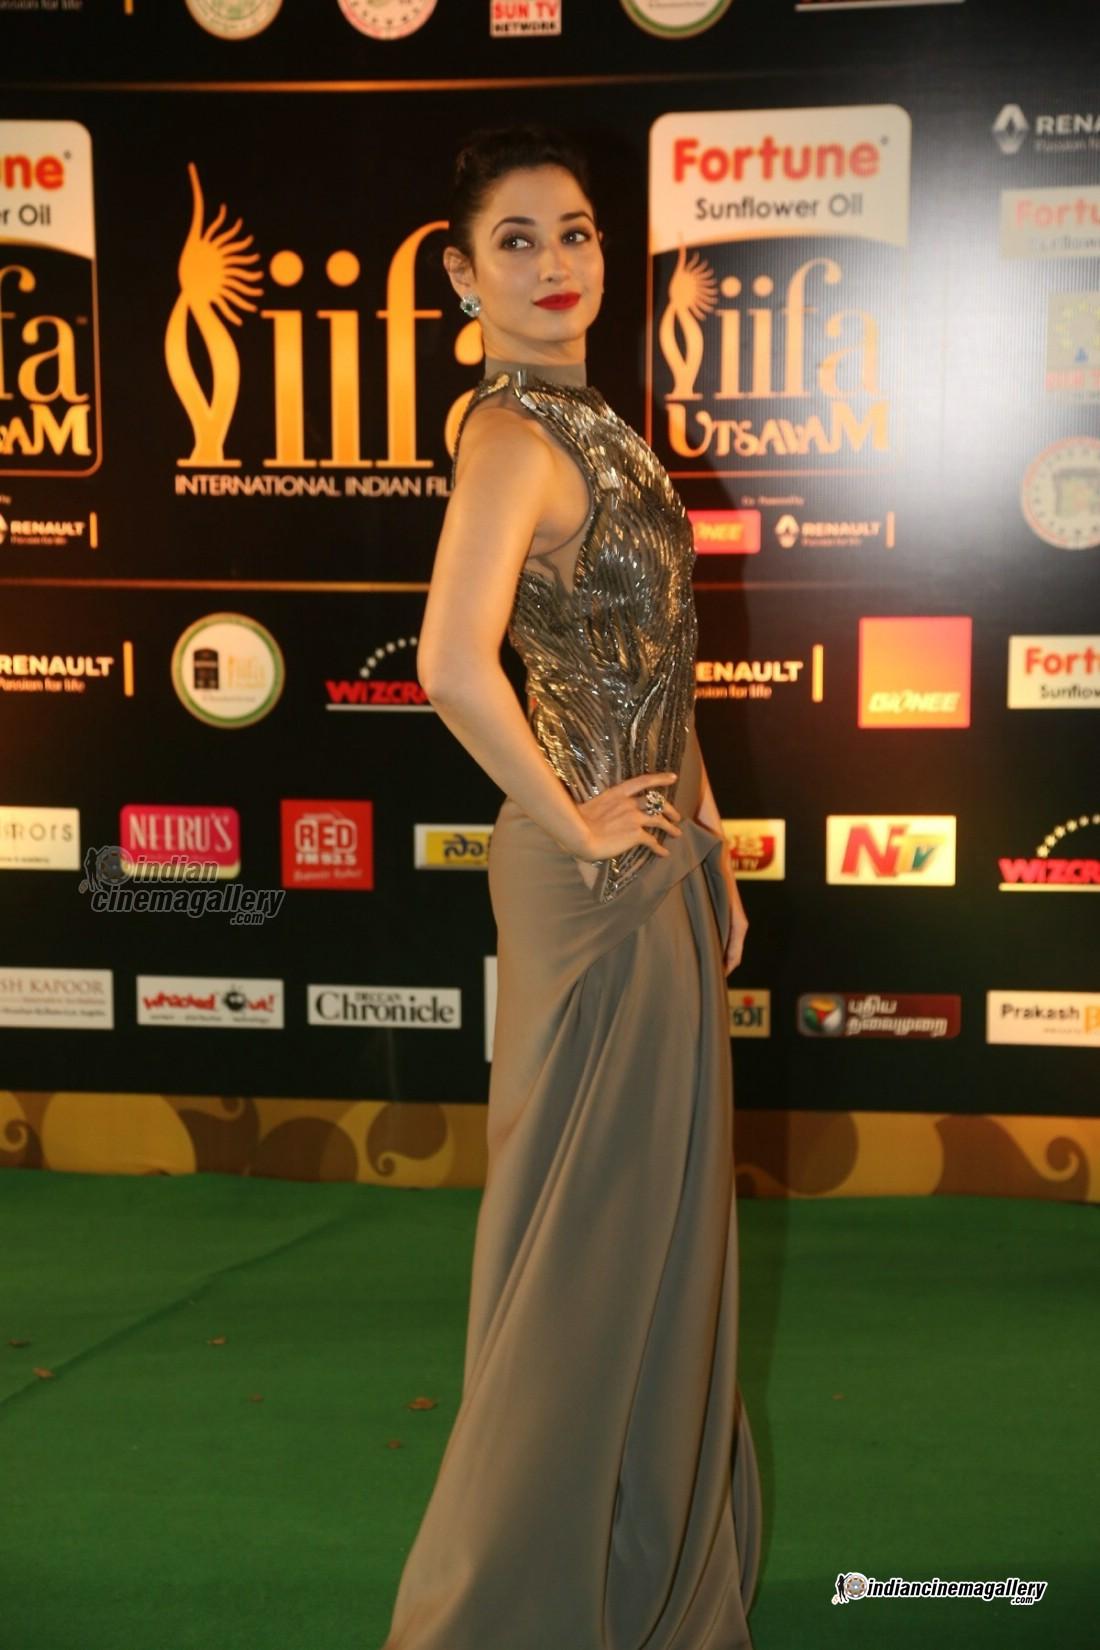 Tamannah-bhatia-at-IIFA-Utsavam-Awards-2016-Day-2-(27)6629